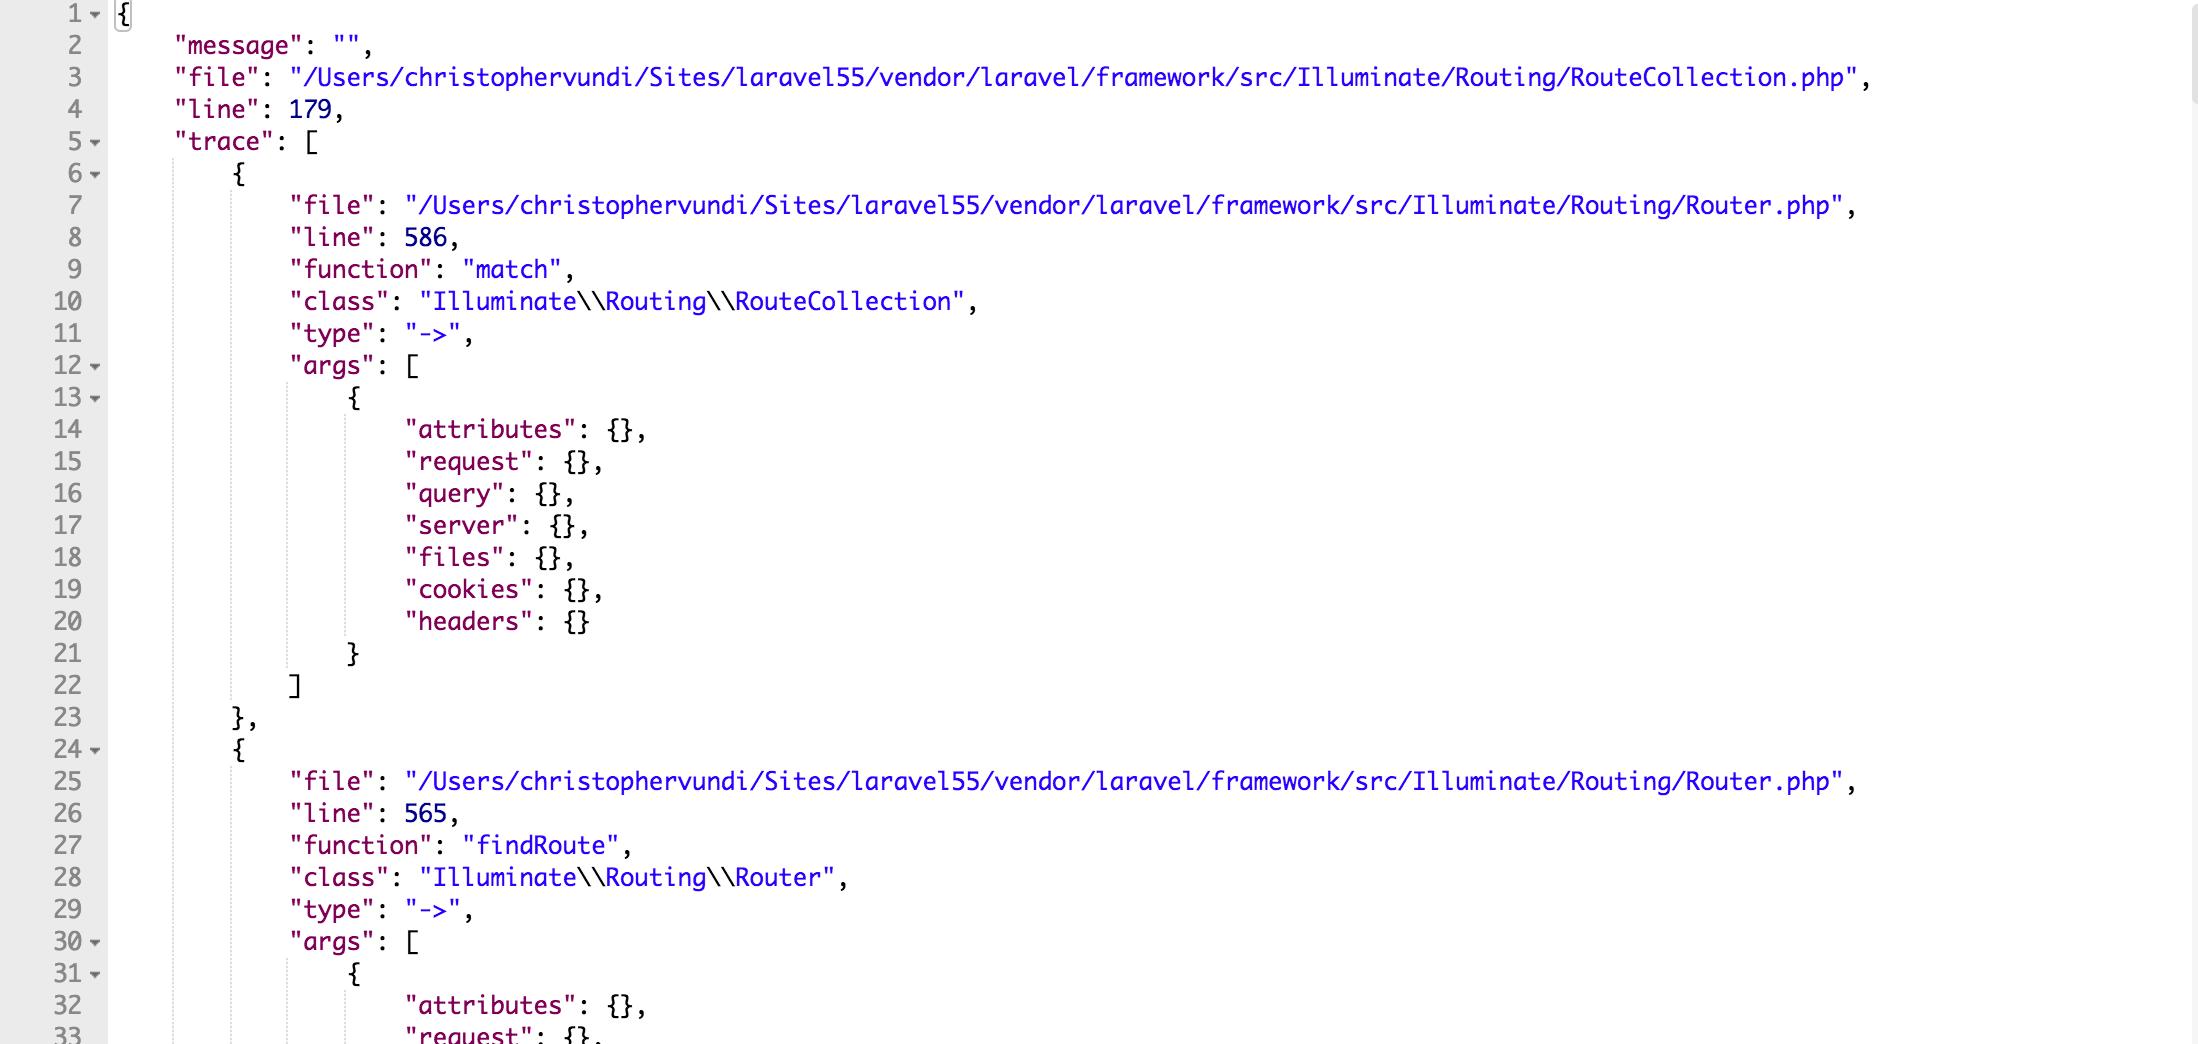 JSON stack trace